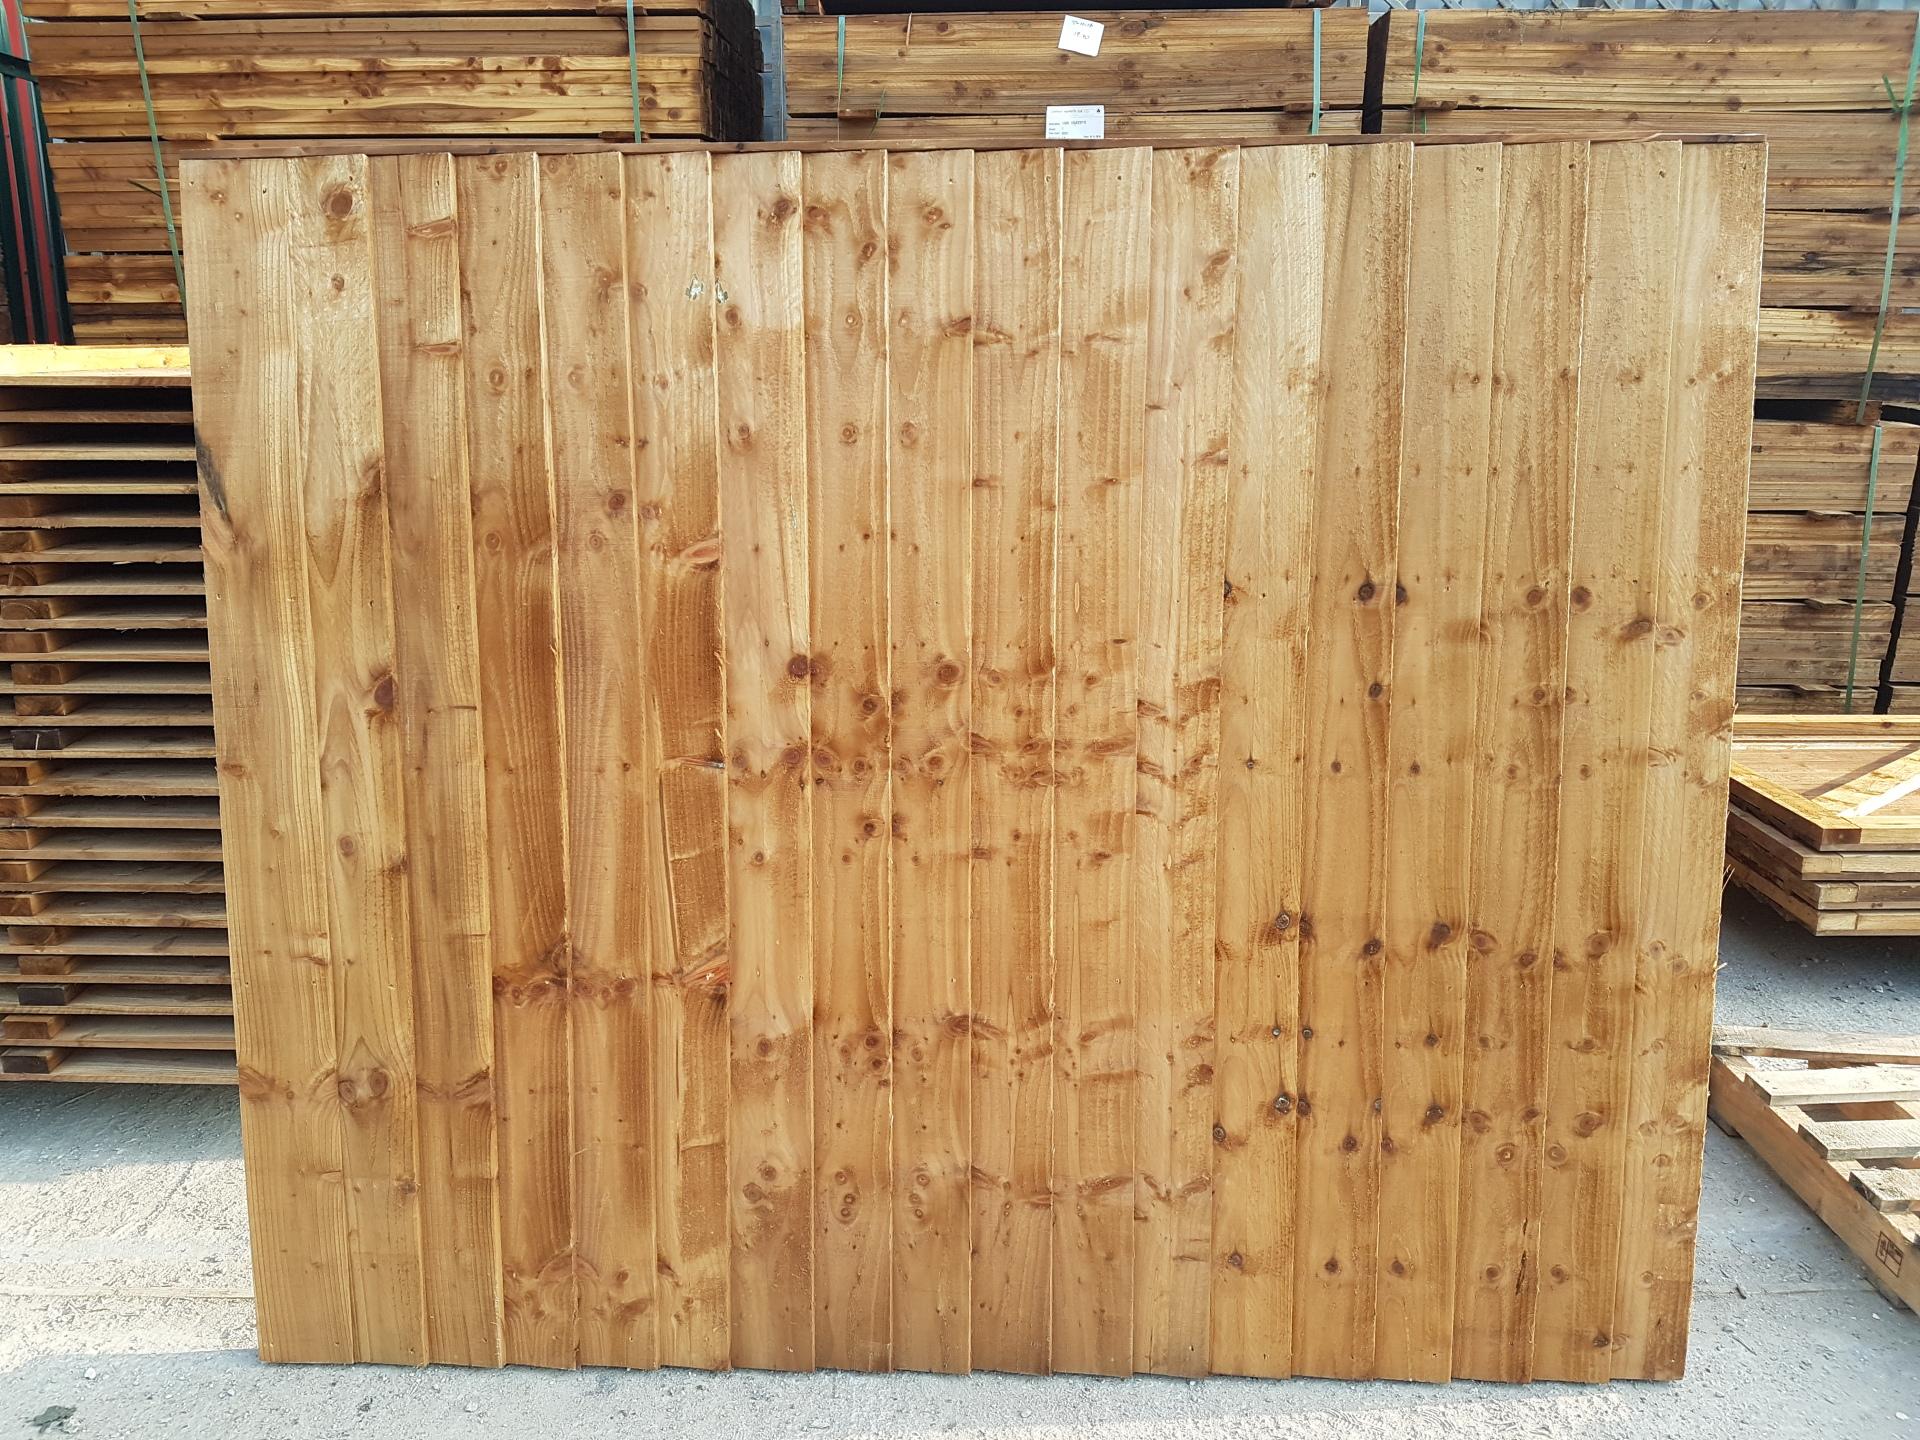 Wooden Fence Panels Pitsea Basildon